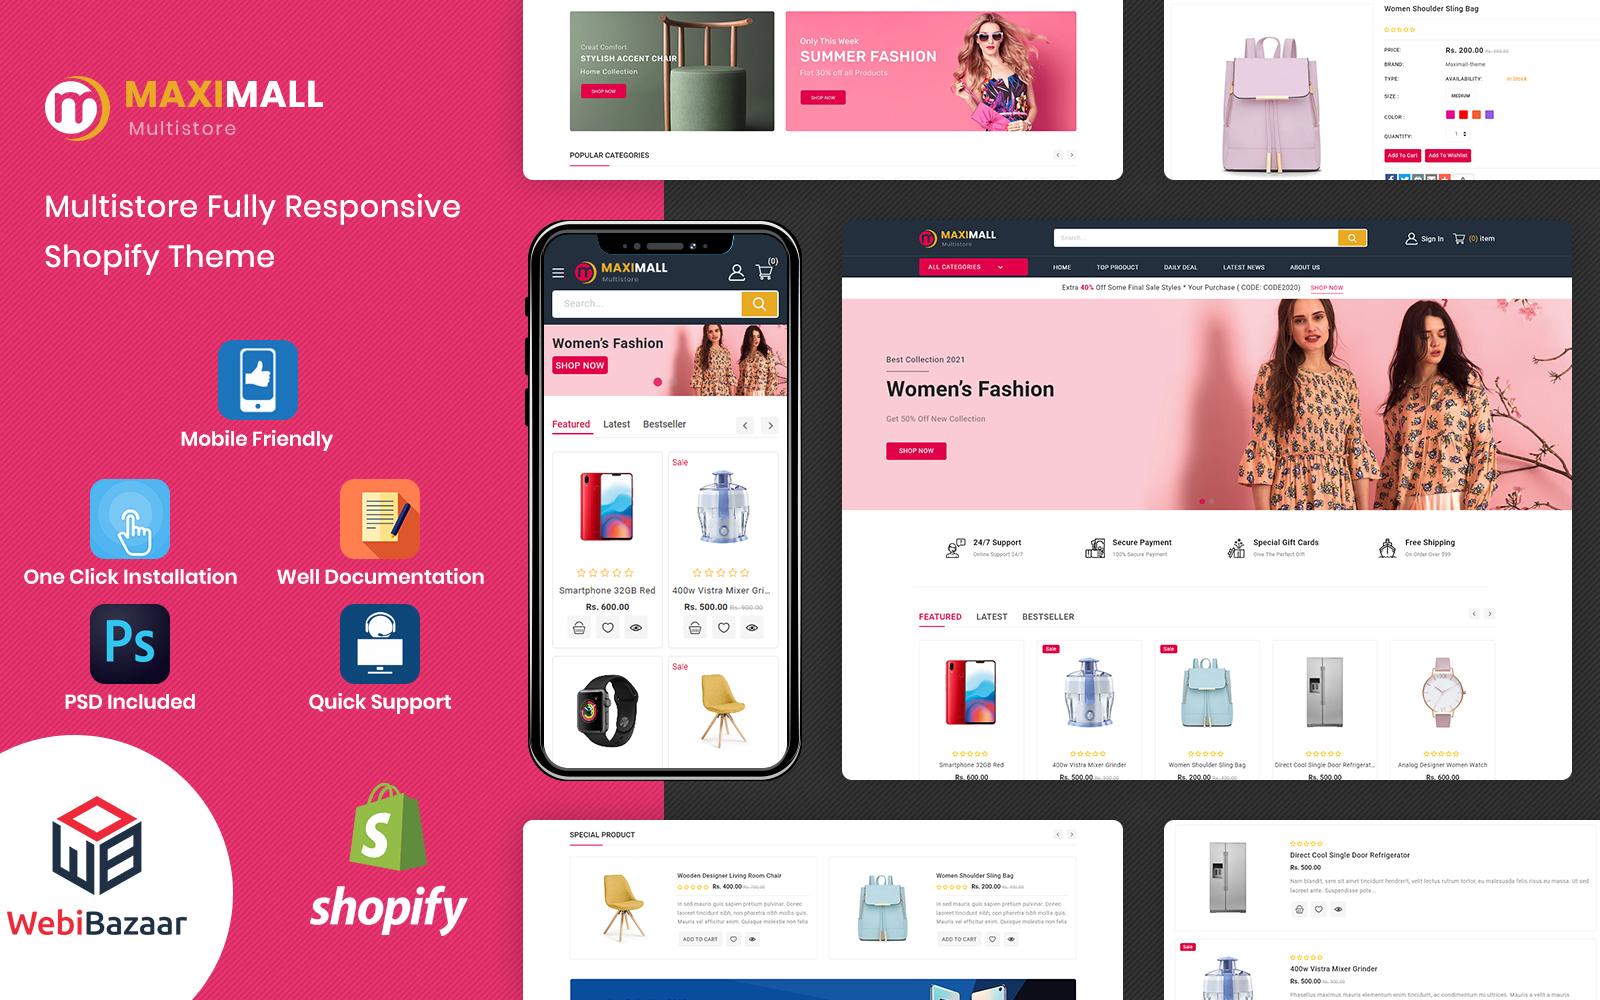 MaxiMall - Multipurpose Premium Shopify Theme